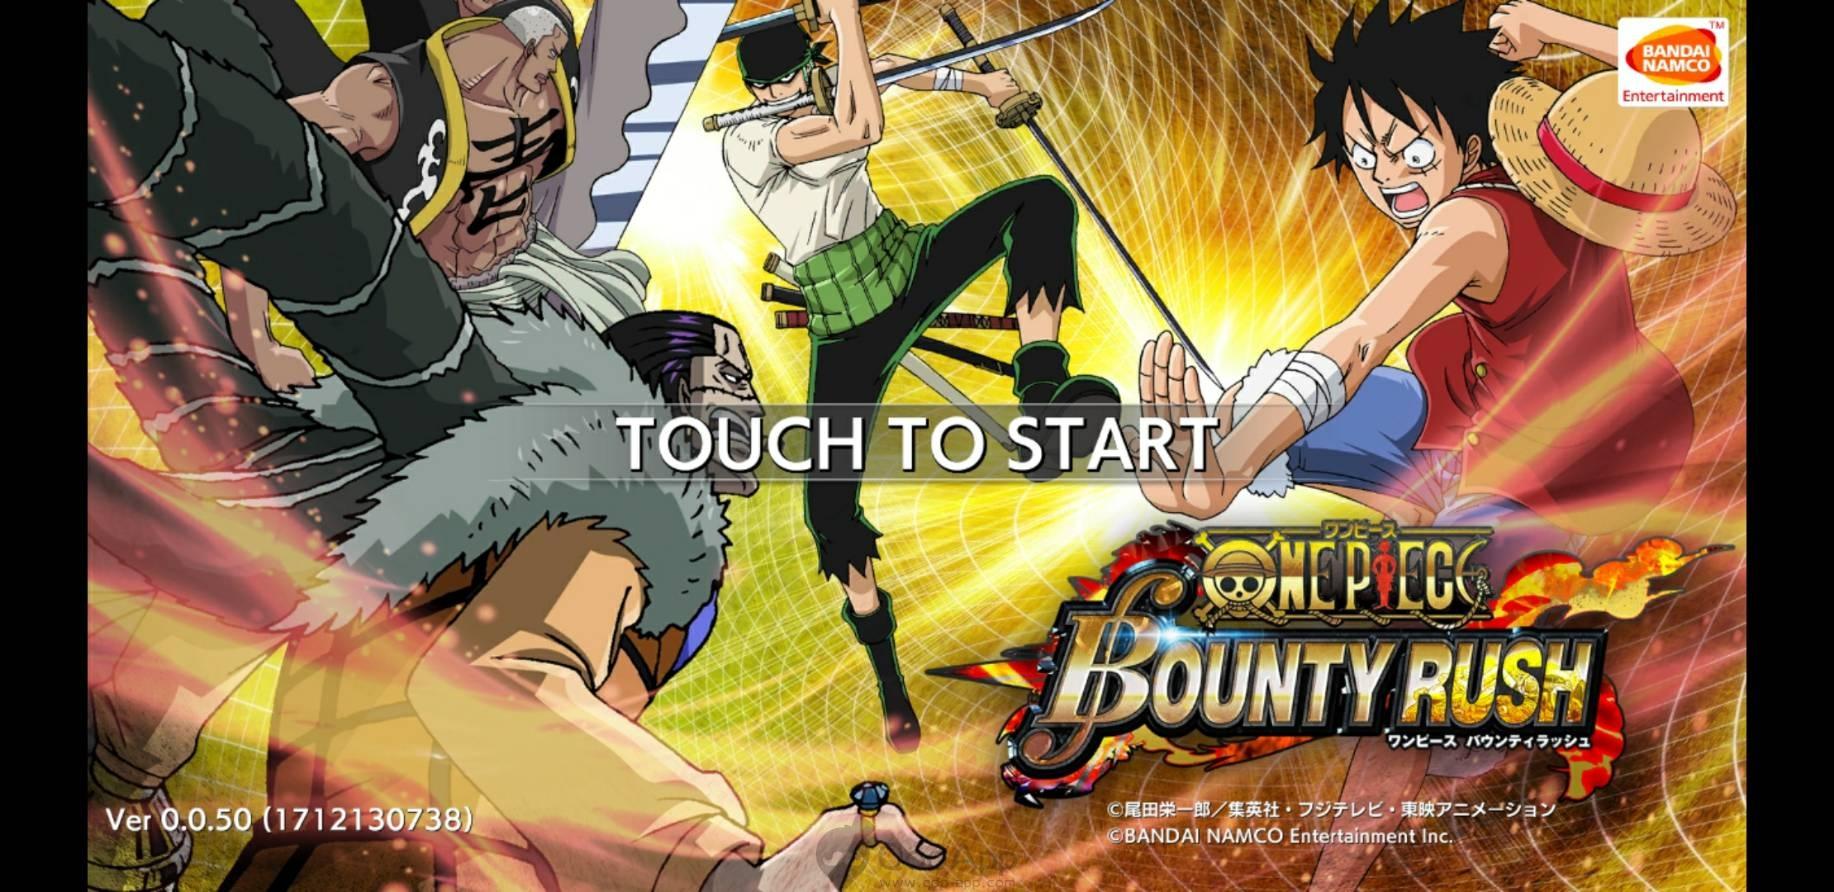 One Piece Bouncy Rush